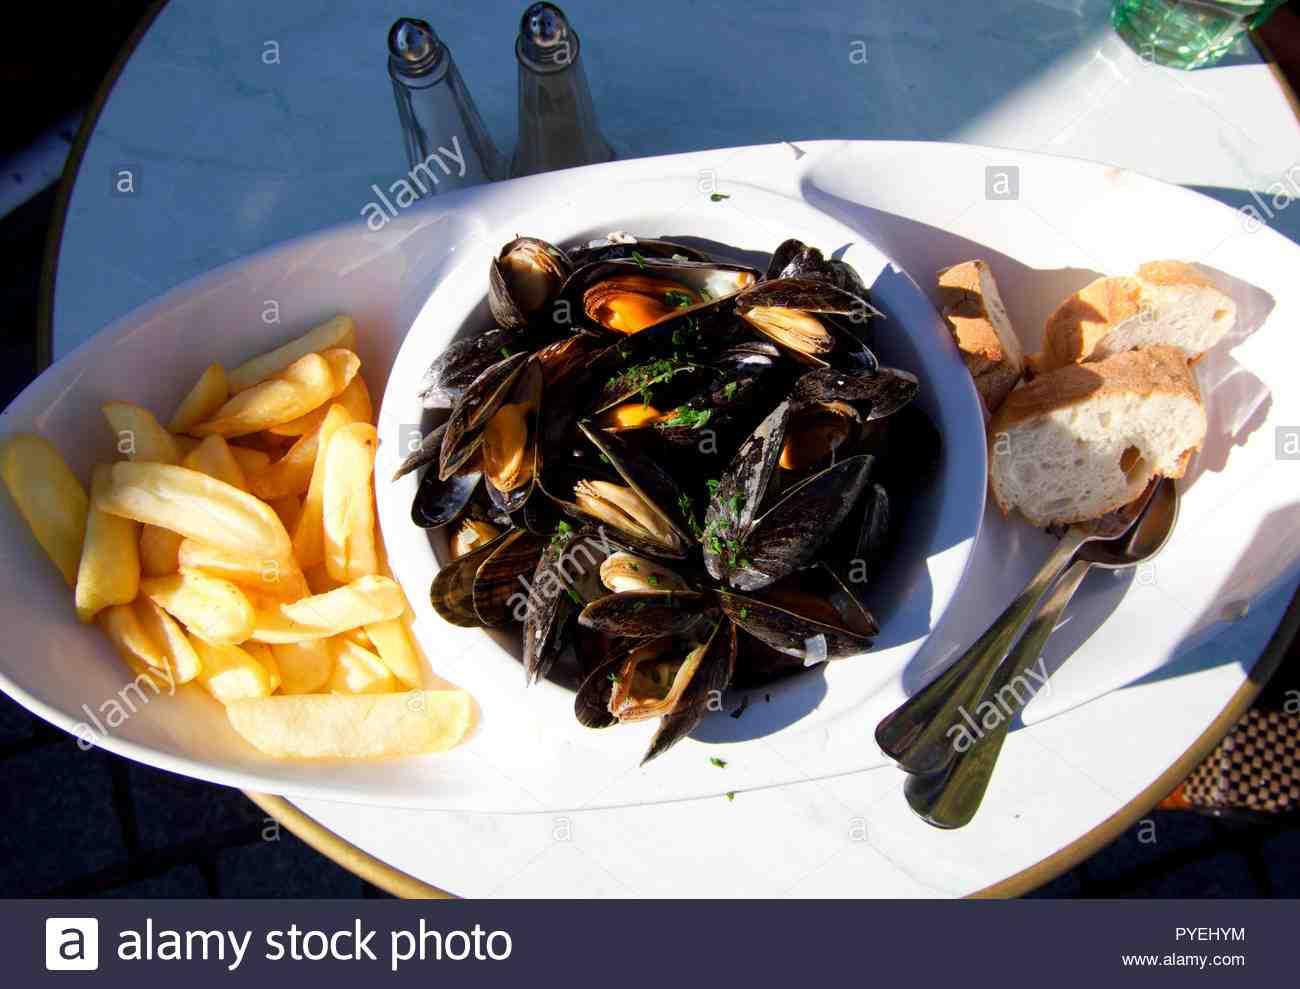 Où manger un bon plat de fruits de mer à Honfleur?